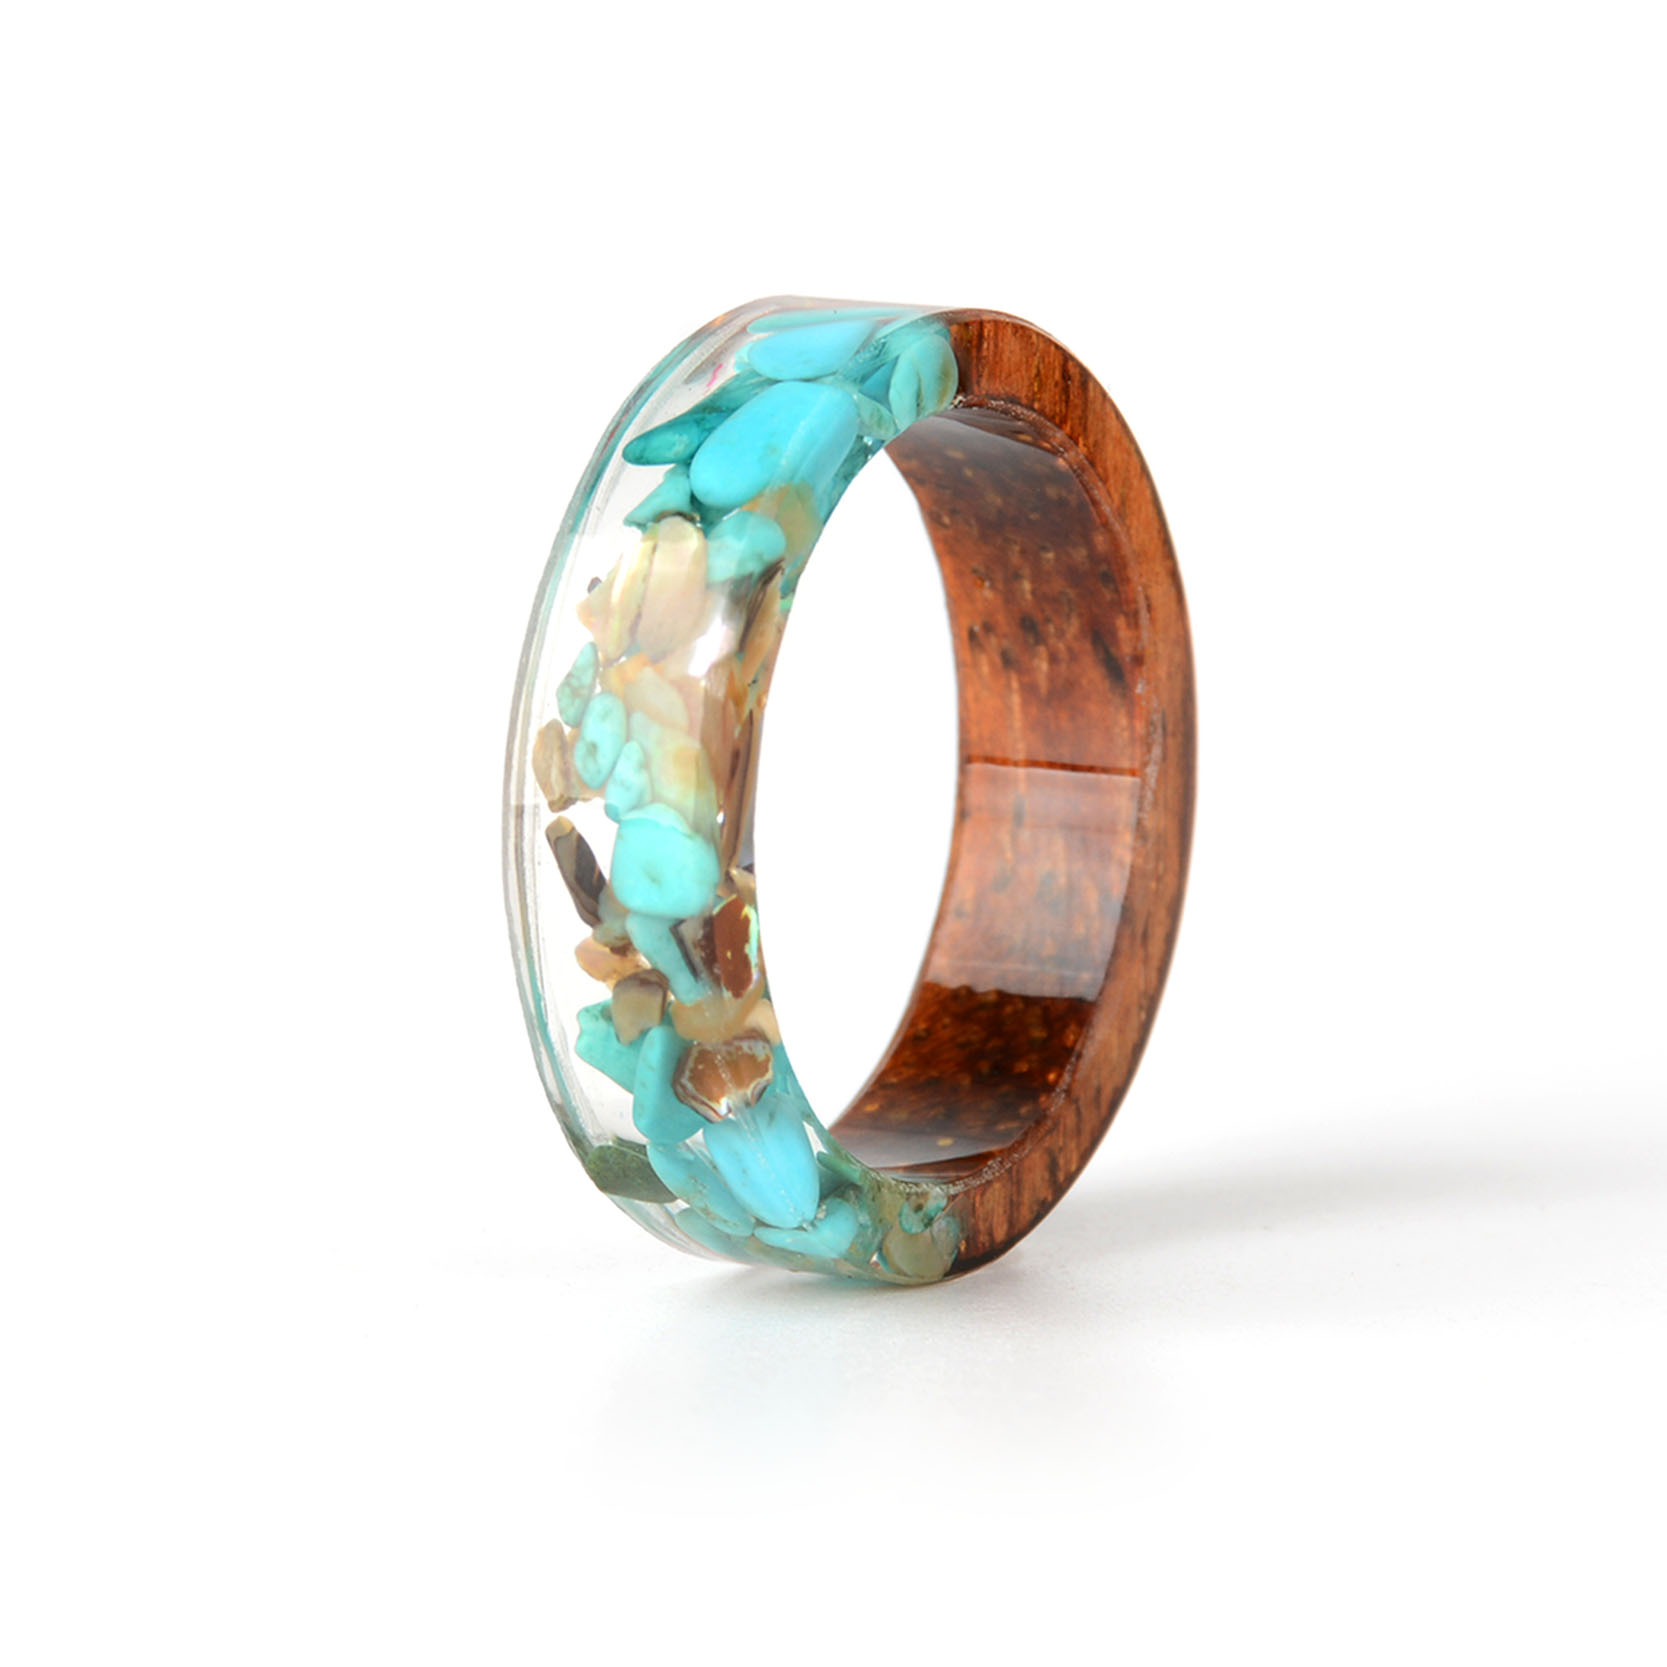 Handmade Wood Resin Ring Many Styles 25